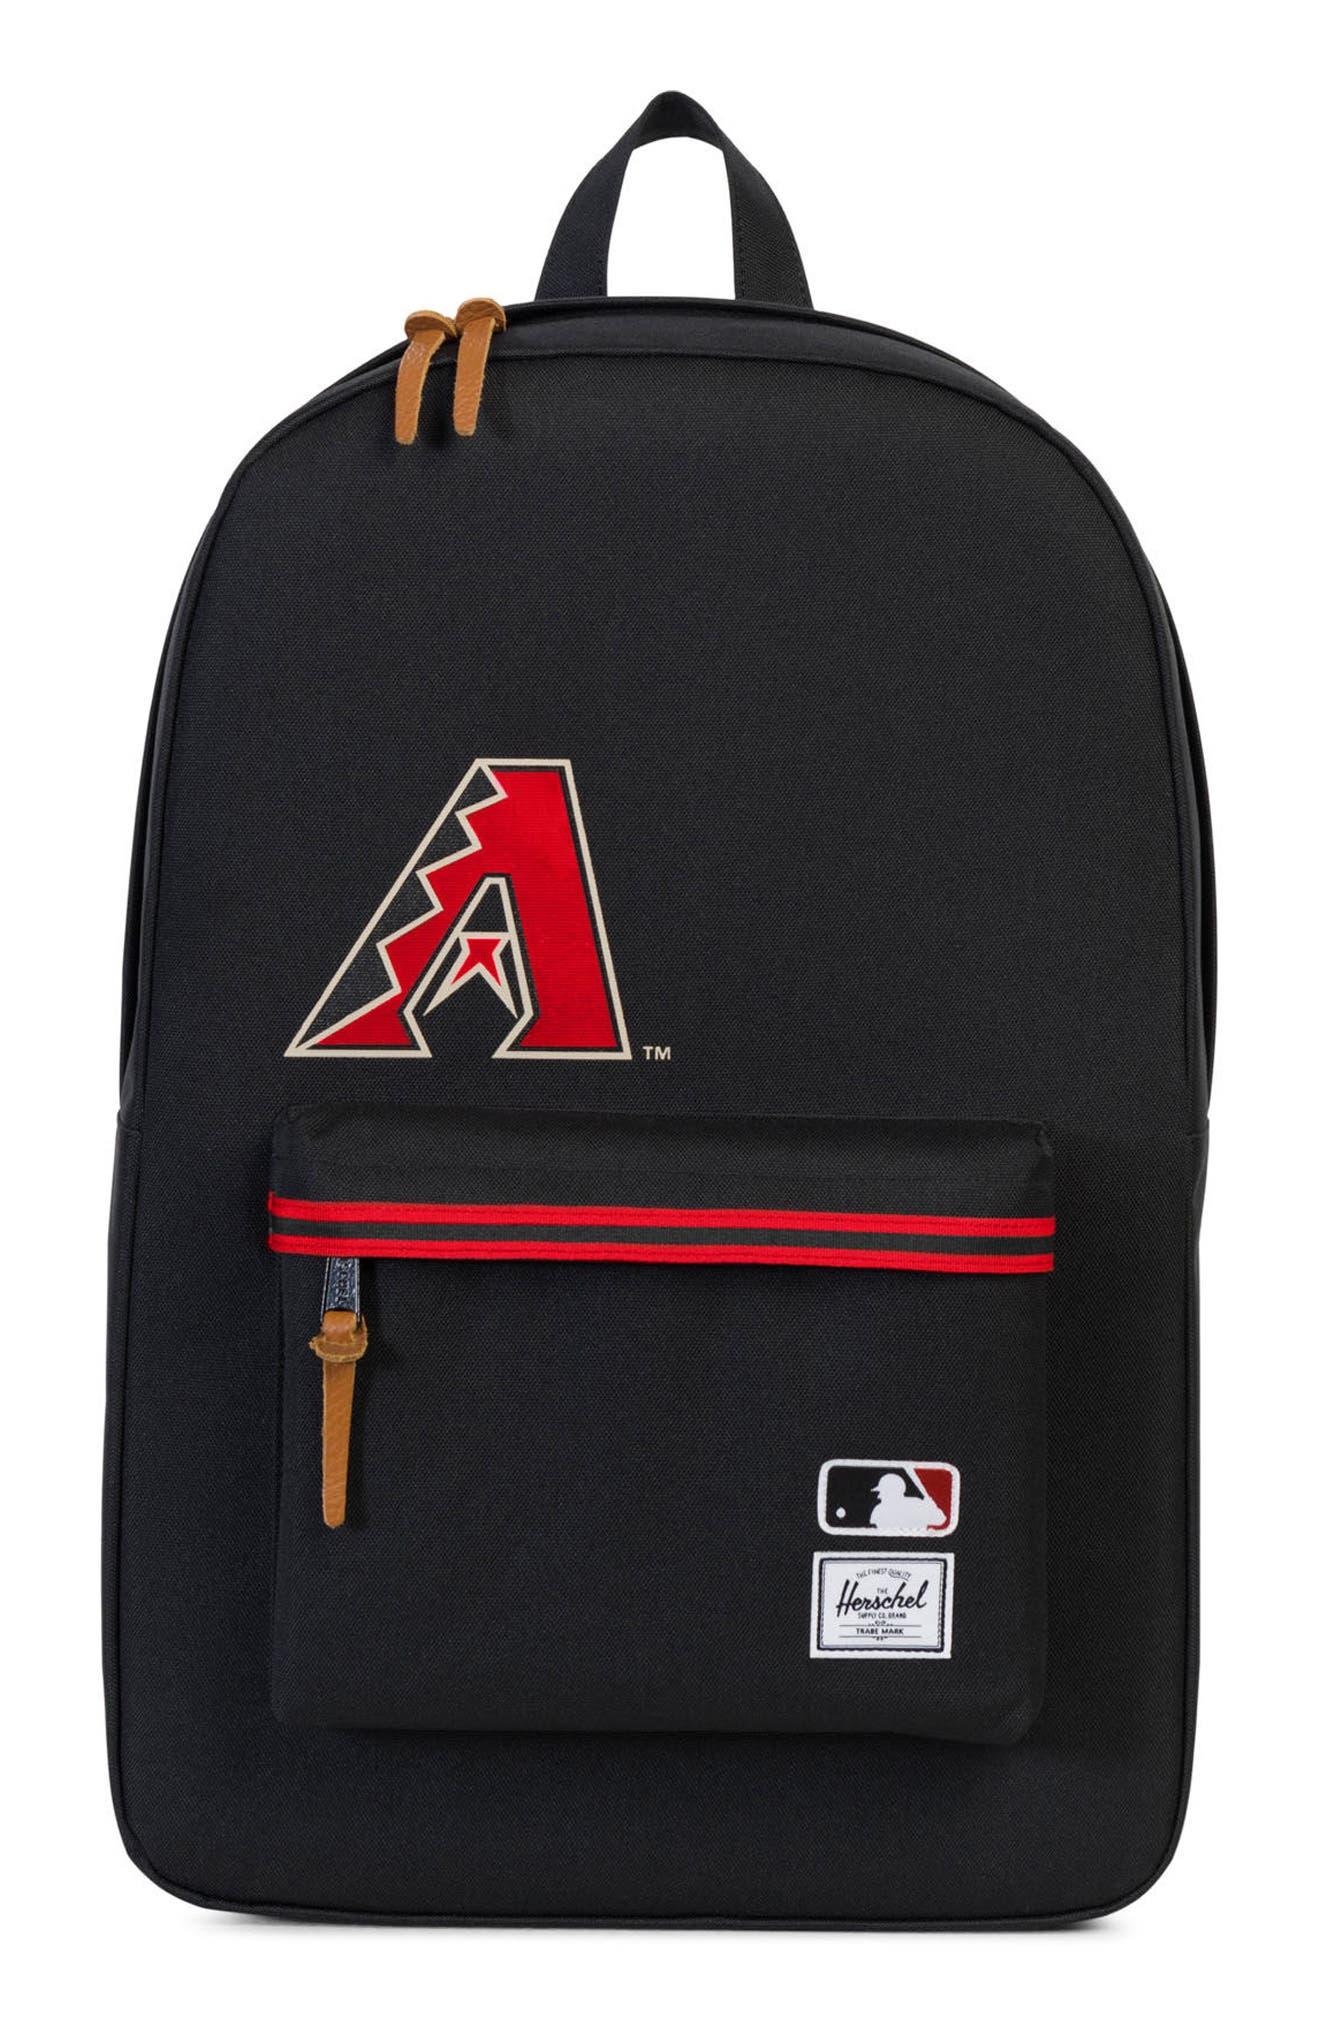 Heritage - MLB National League Backpack,                             Main thumbnail 1, color,                             001